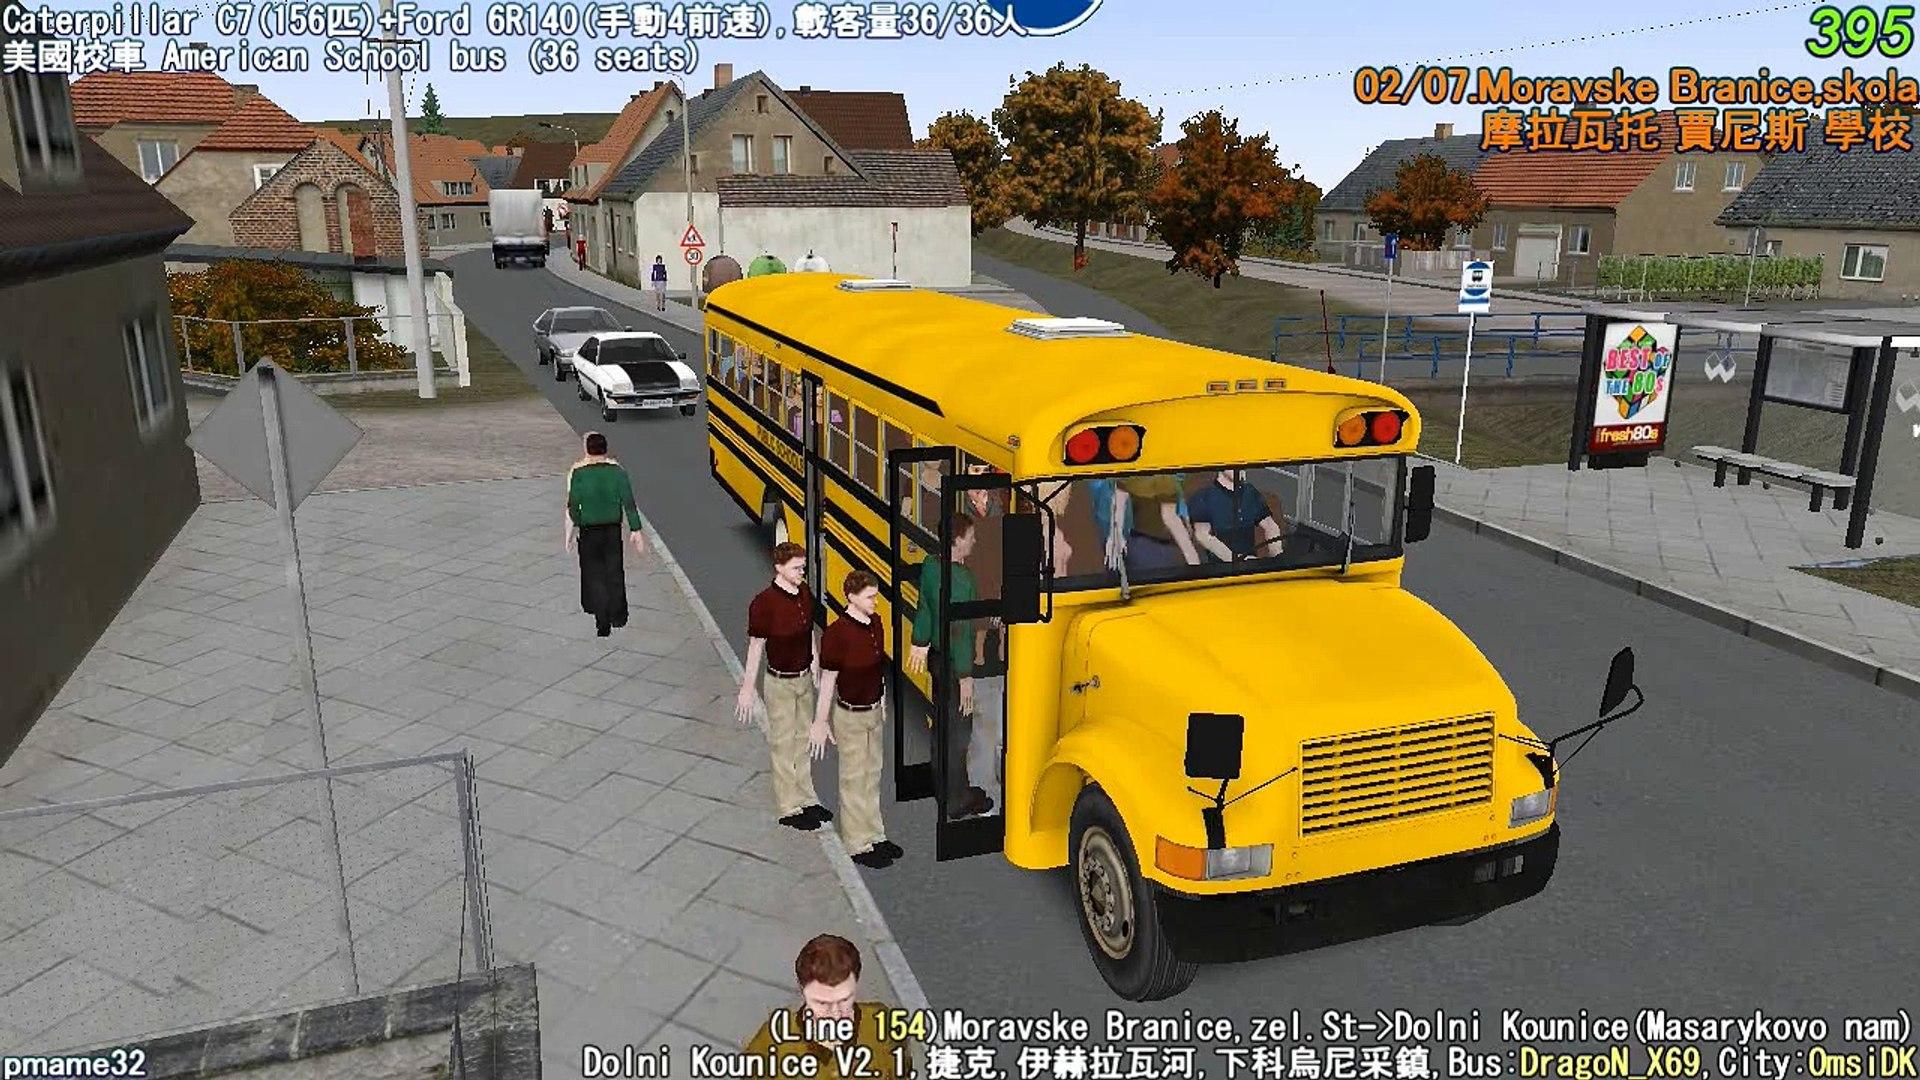 Omsi 2 tour (549) Czech Line 154 Moravske Branice - Masarykovo nam @  American School bus